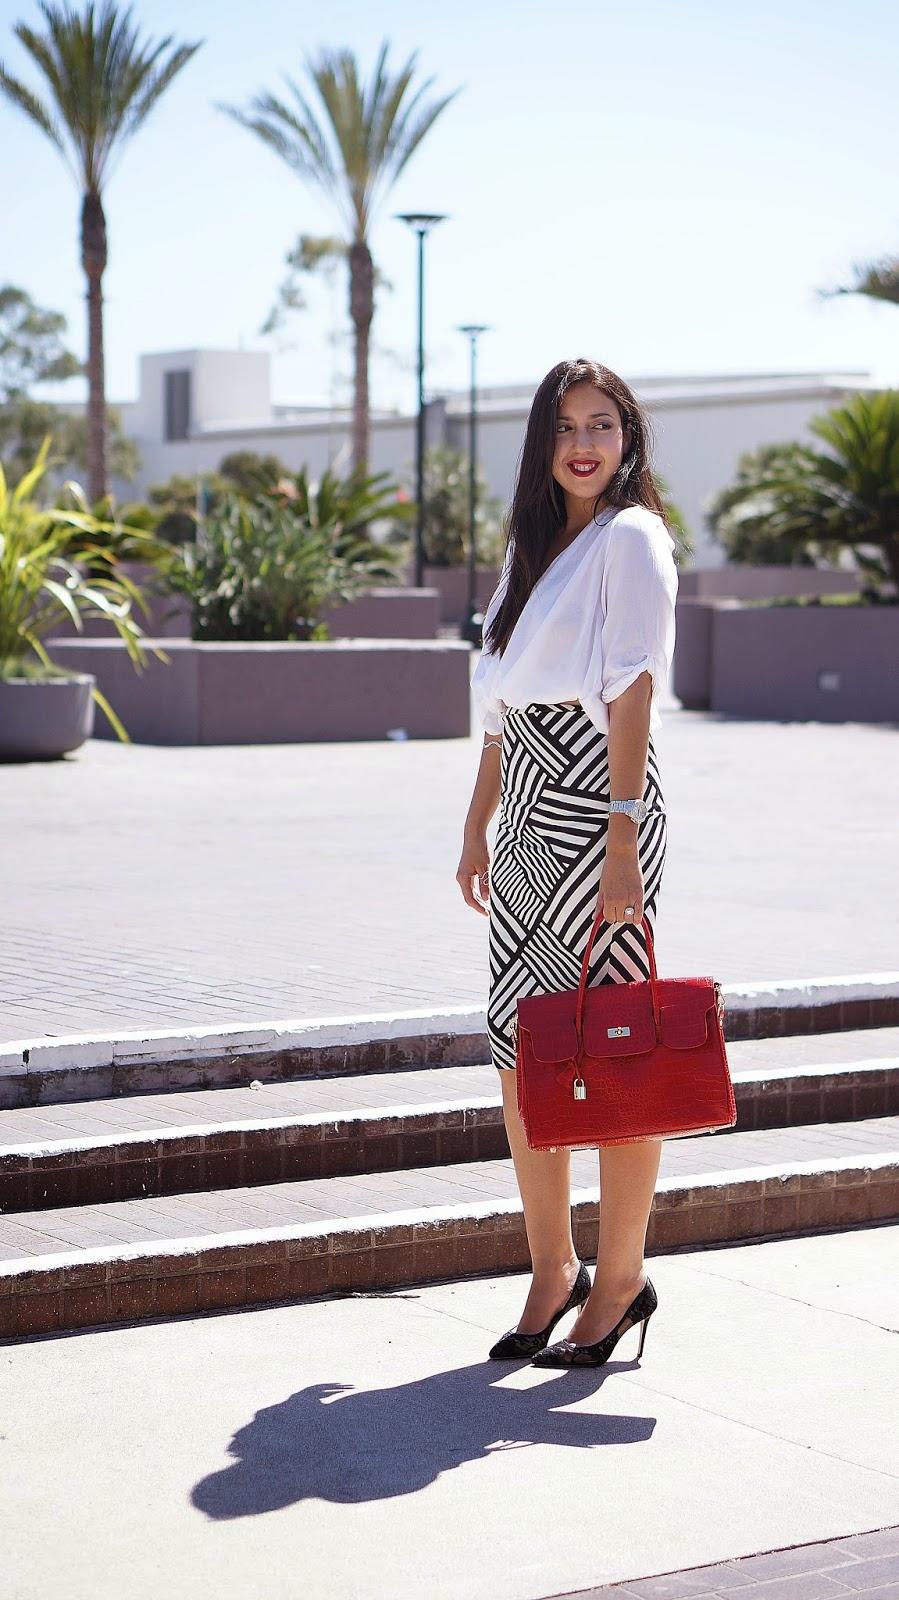 Kardashian Kollection chevron pencil skirt, Fashion blogger, Lace heels, Spring Style, Shoemint black heels